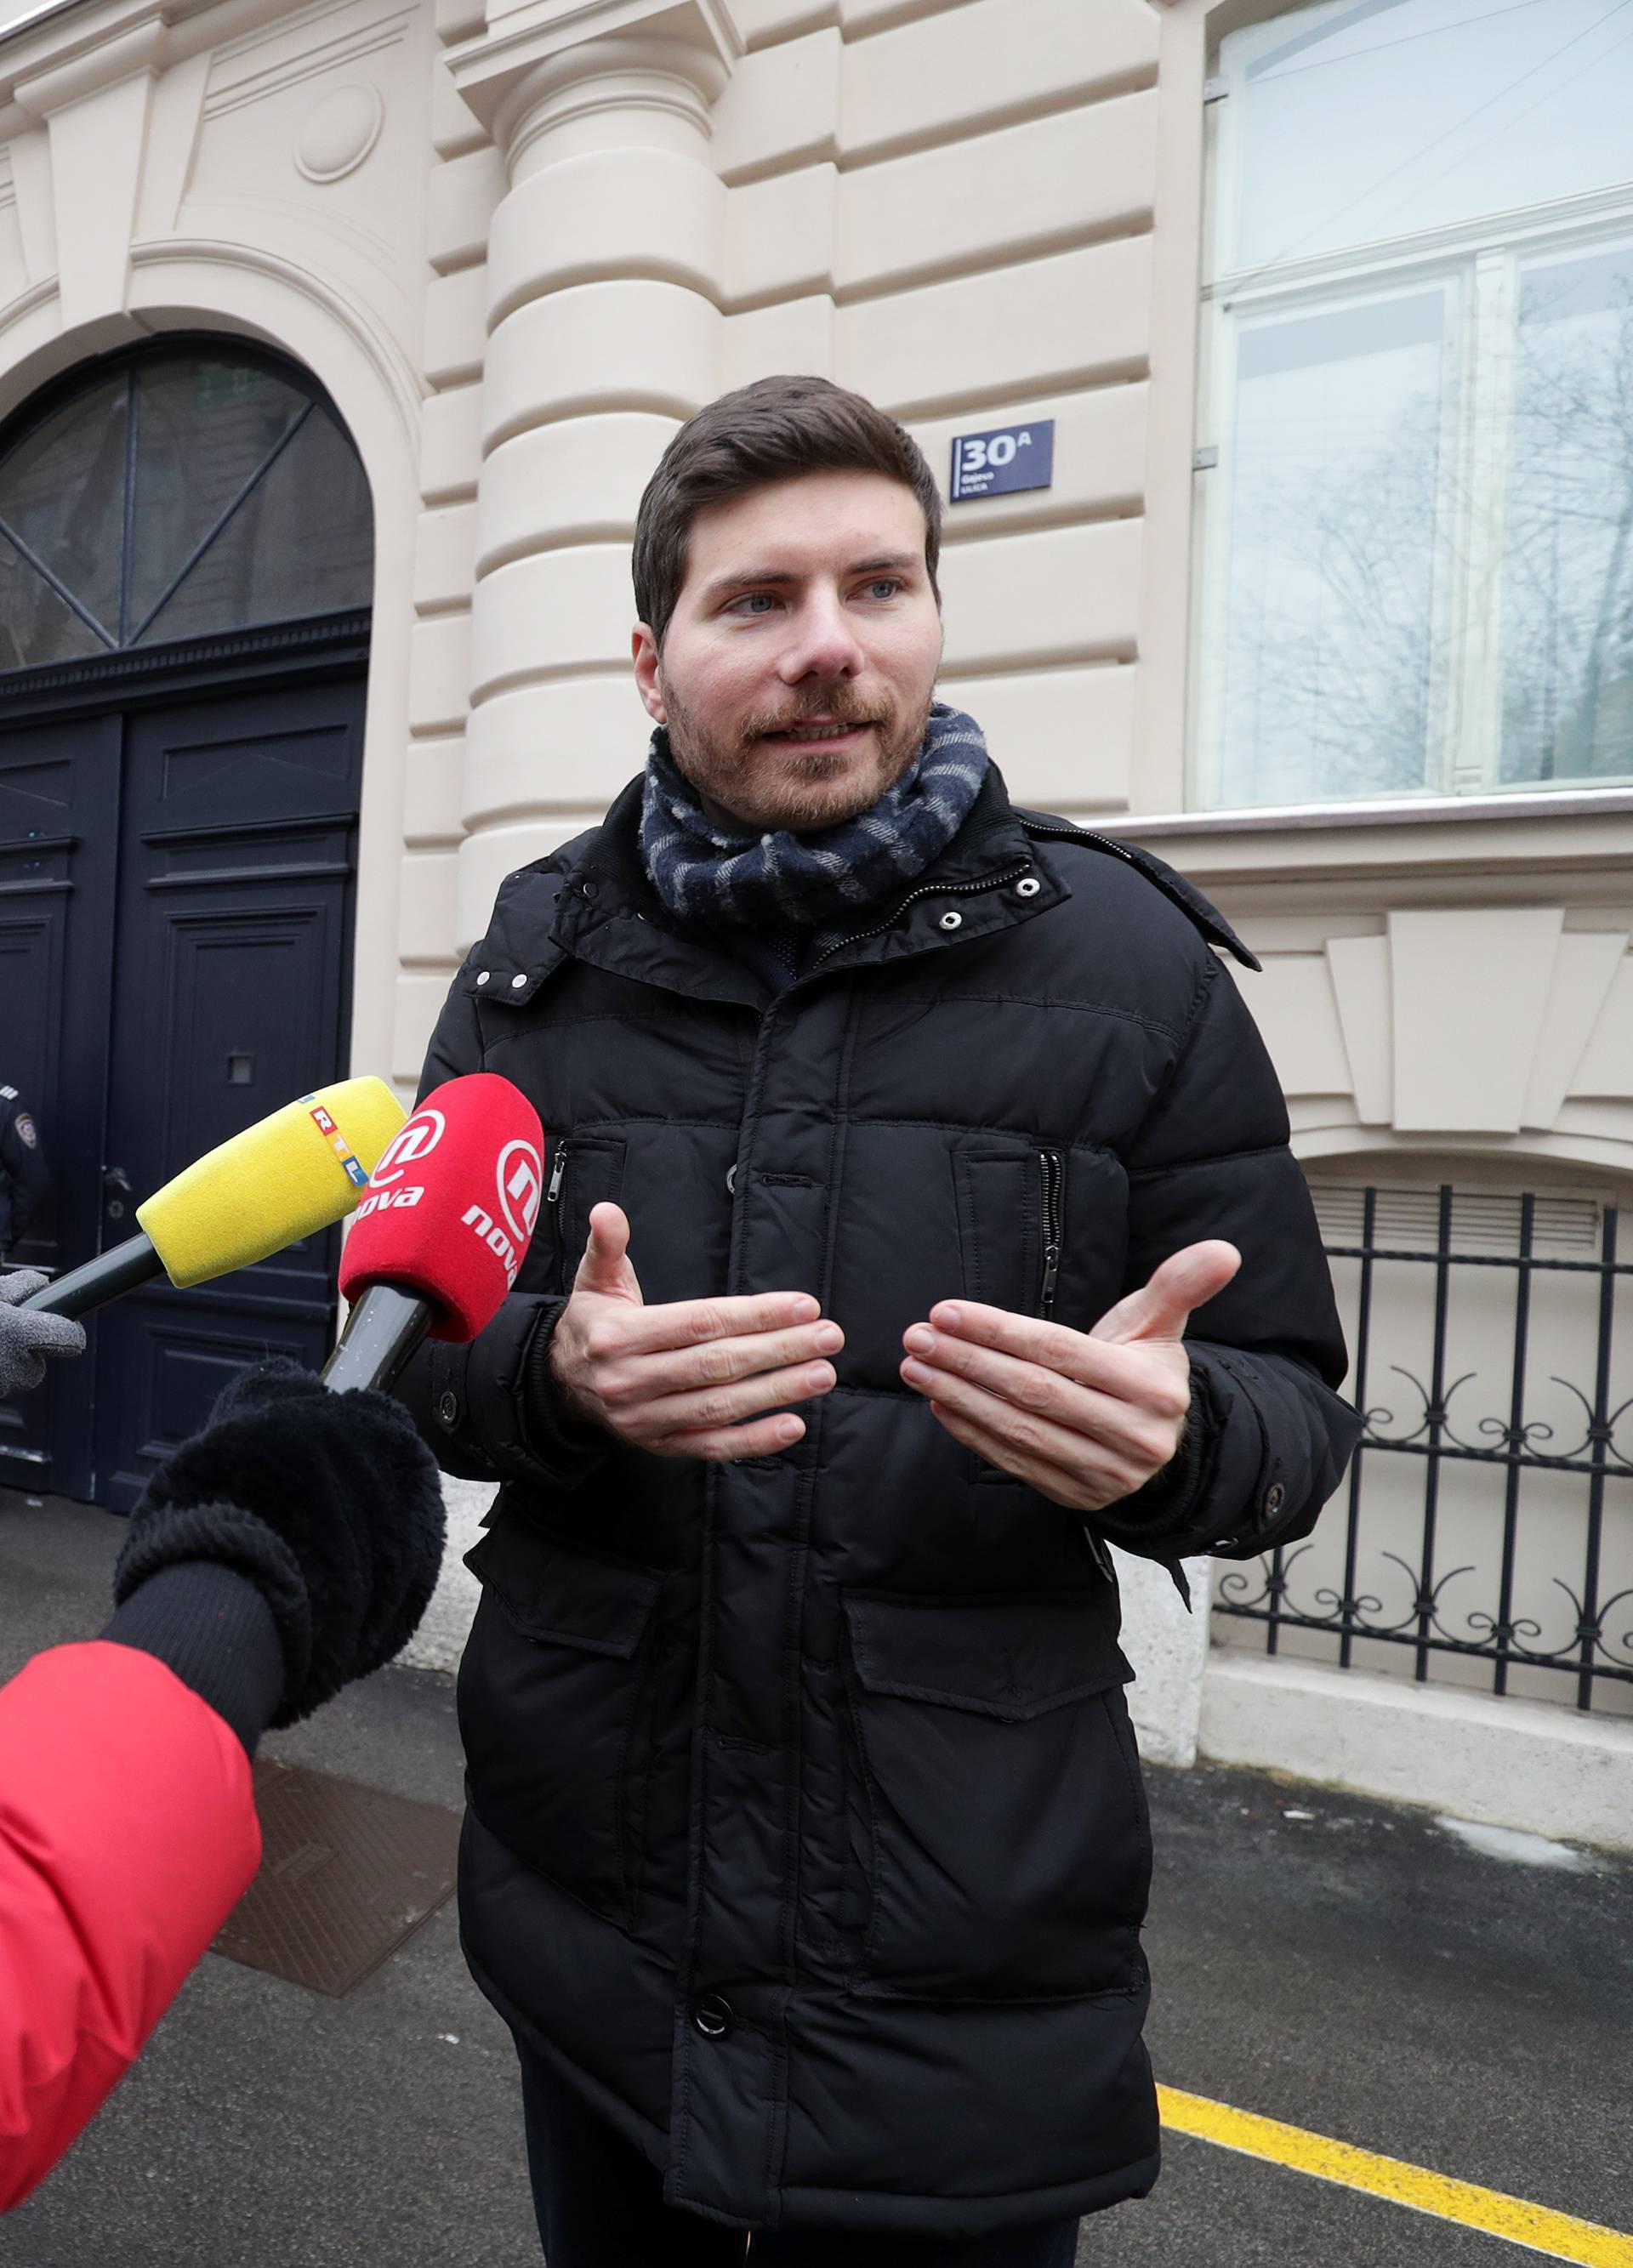 Zagreb: Saborski zastupnik Ivan Pernar održao konferenciju za medije ispred zgrade DORH-a